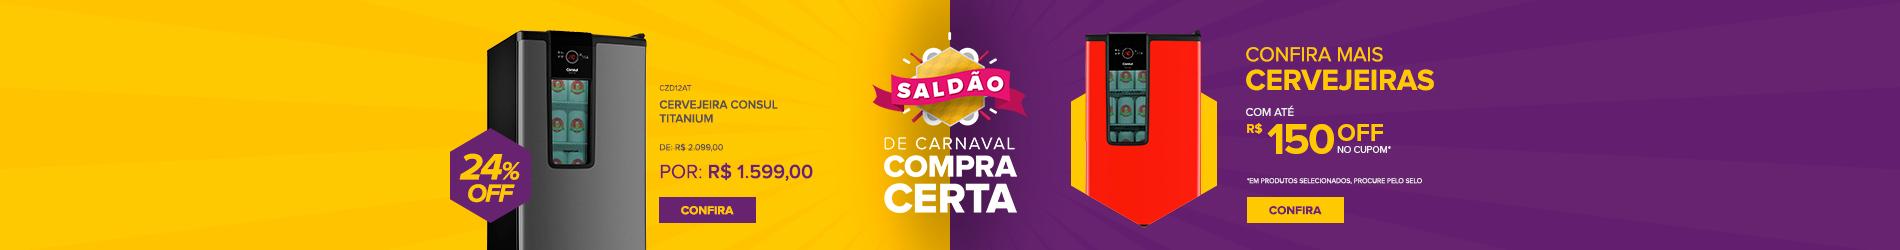 Promoção Interna - 2252 - saldao-carnaval_CZD12AT-cupomcervejeira-duplo_14022018_home2 - CZD12AT-cupomcervejeira-duplo - 2